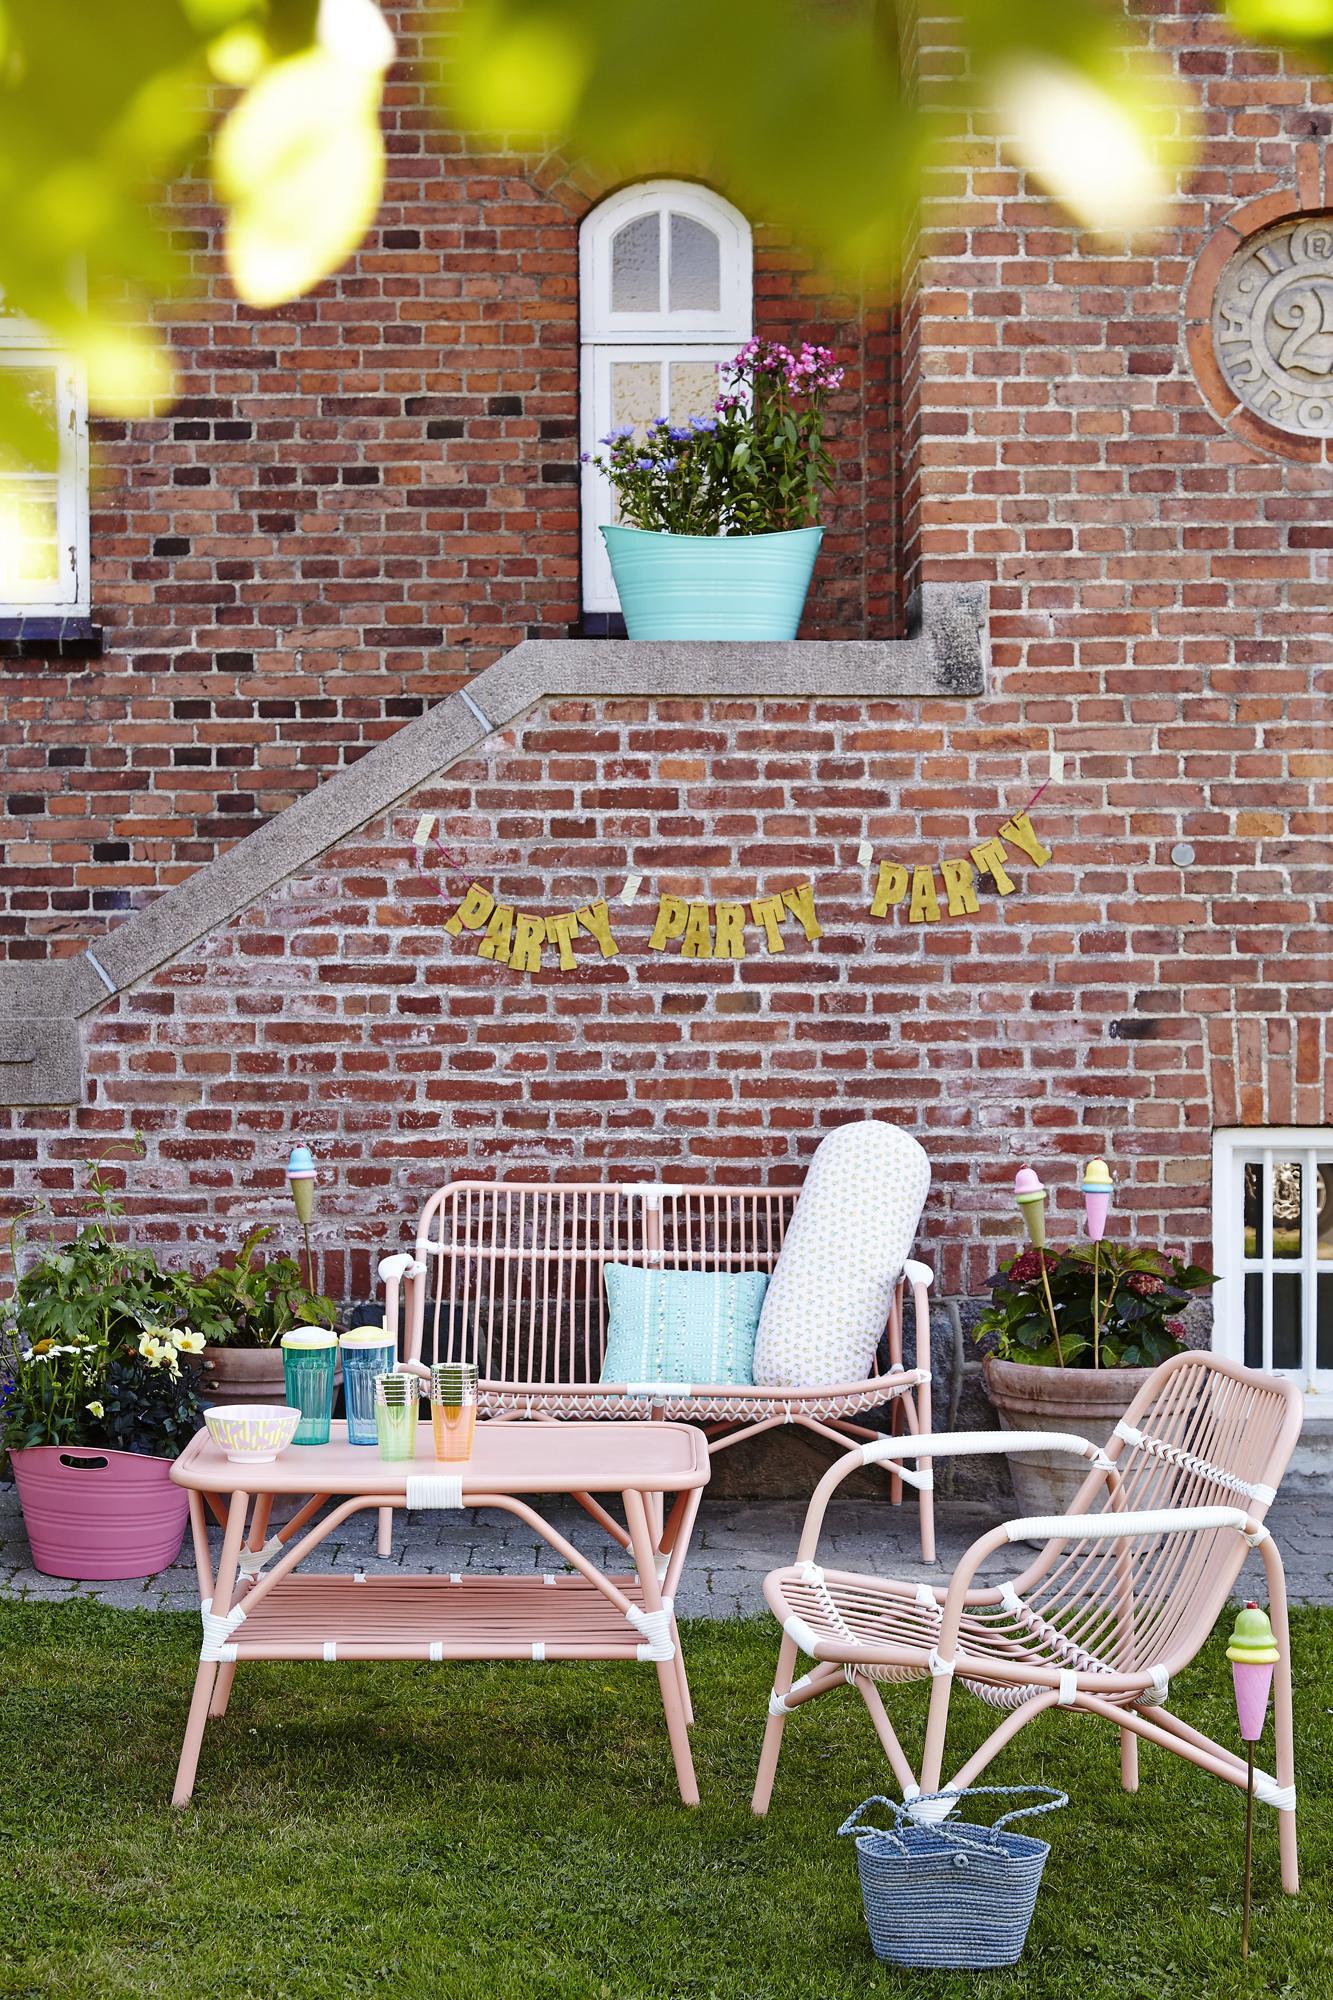 Tischdeko Garten • Bilder & Ideen • COUCHstyle